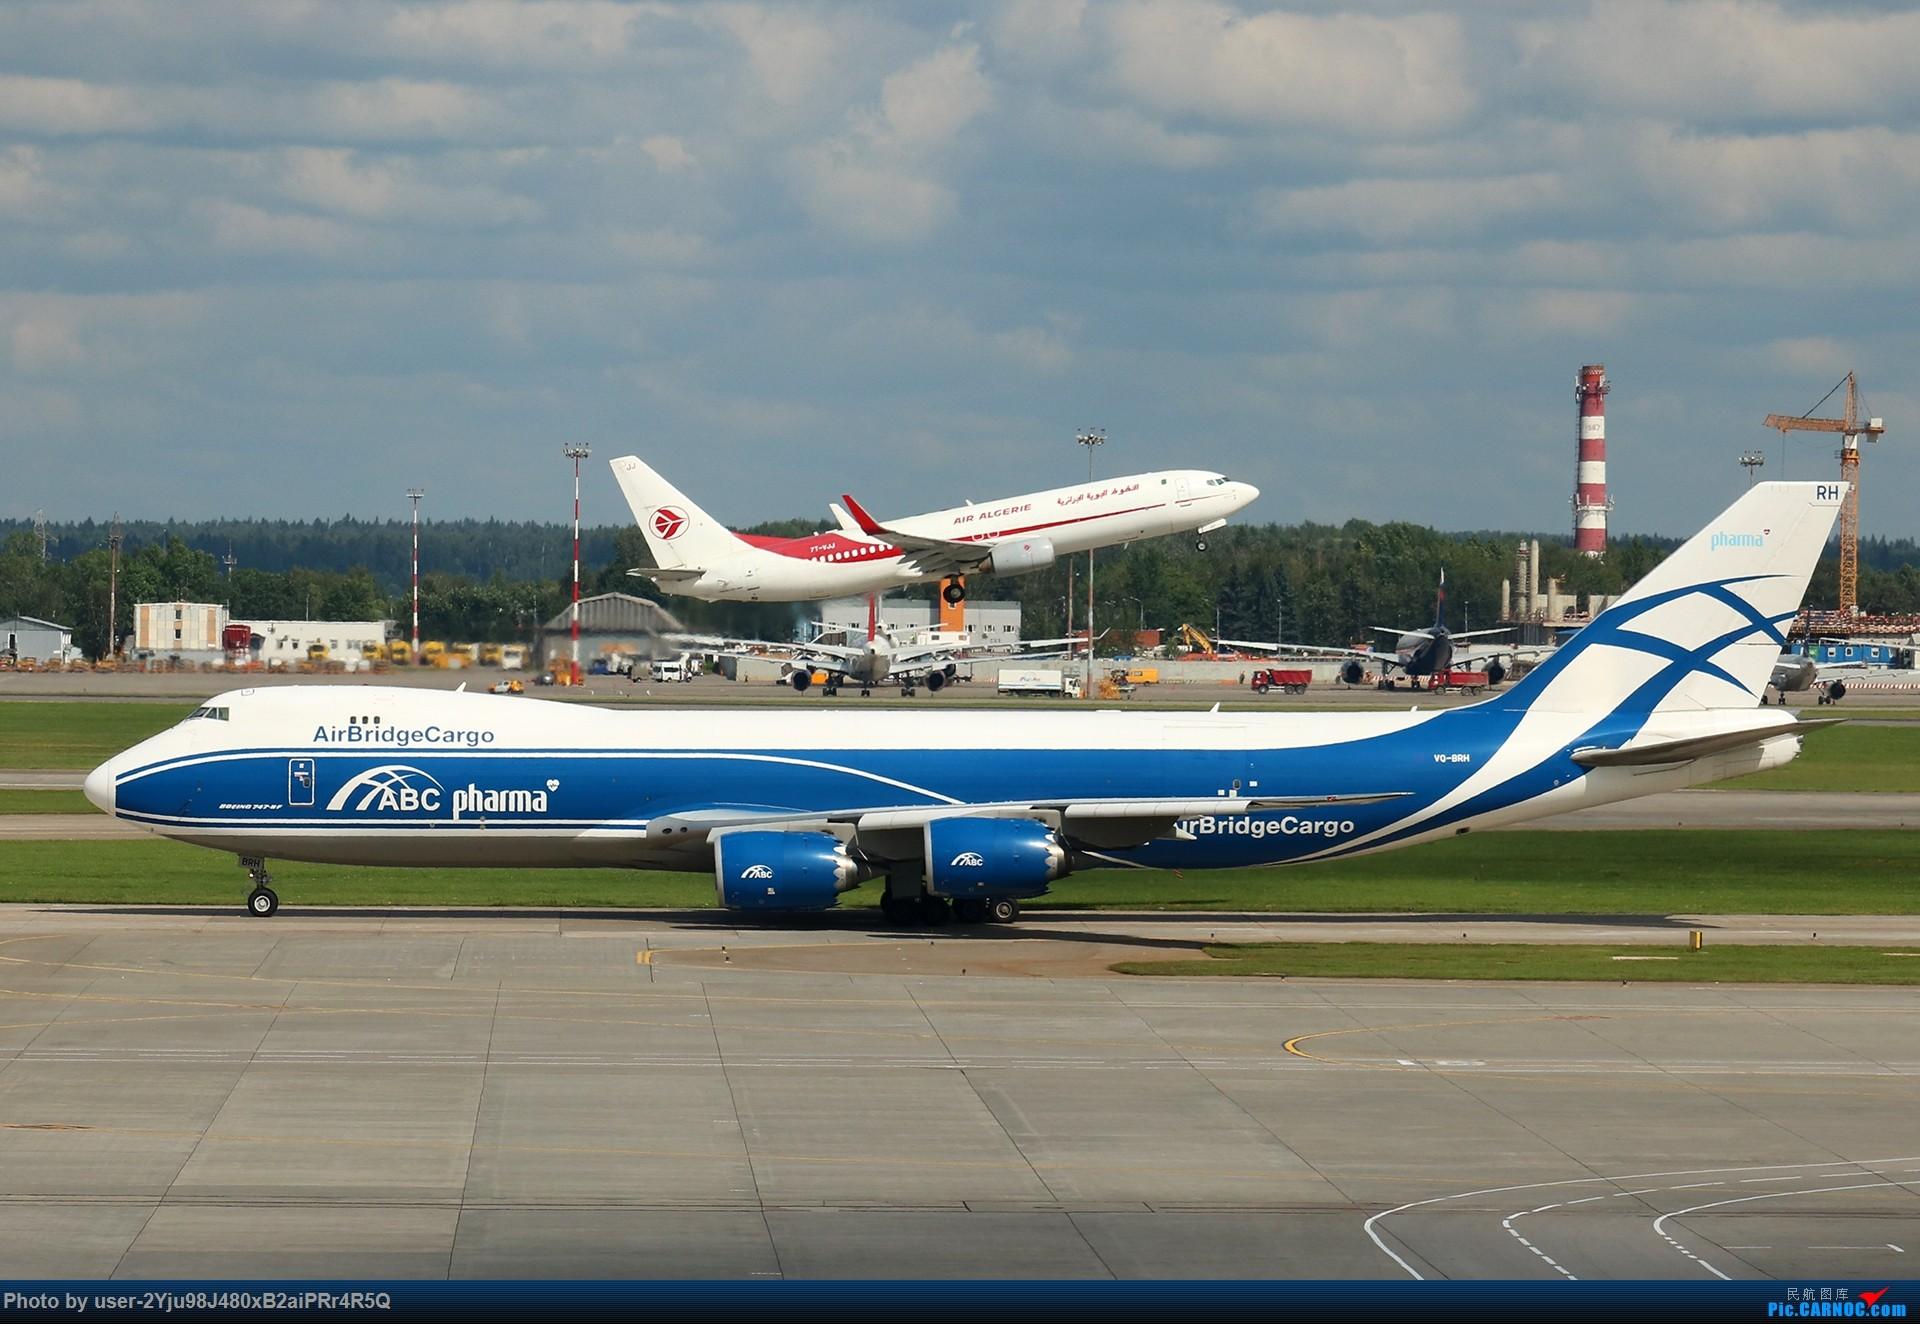 Re:[原创]LIULIU|Sheremetyevo的漫游|俄罗斯空桥货运 BOEING 747-8F VQ-BRH 俄罗斯谢诺梅杰沃机场